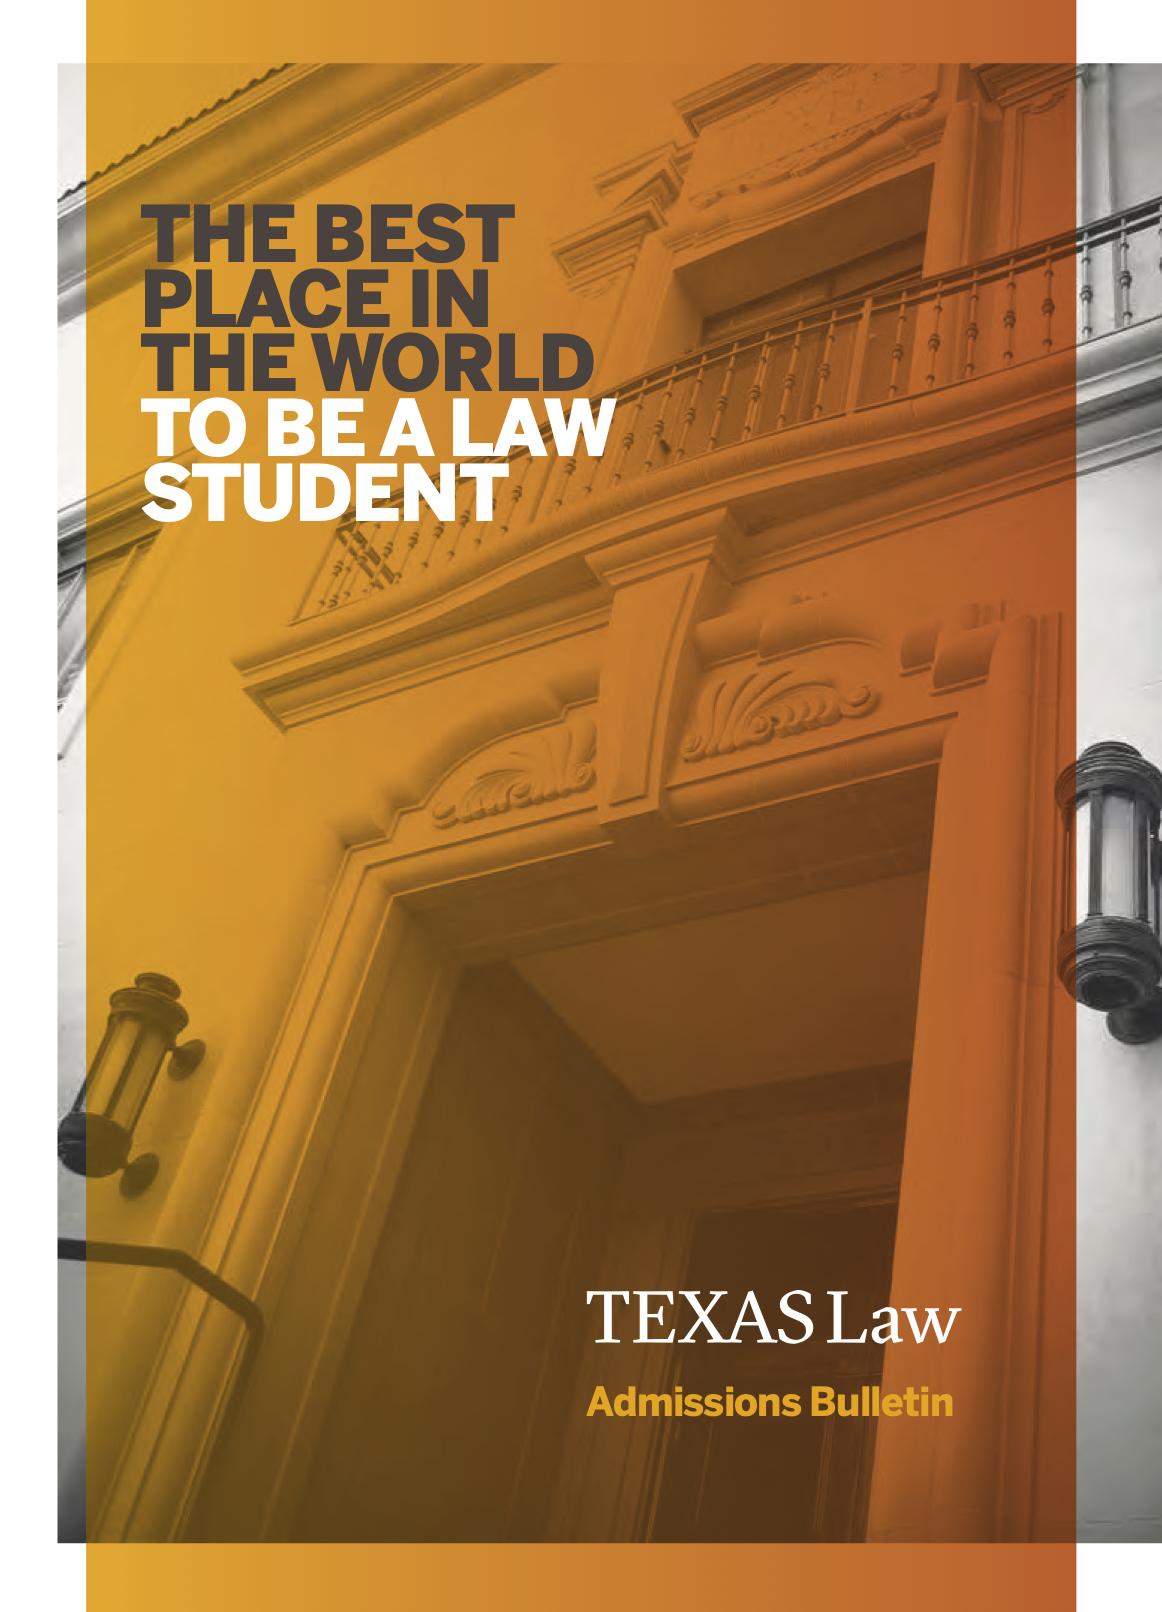 Texas Law J.D. Bulletin cover